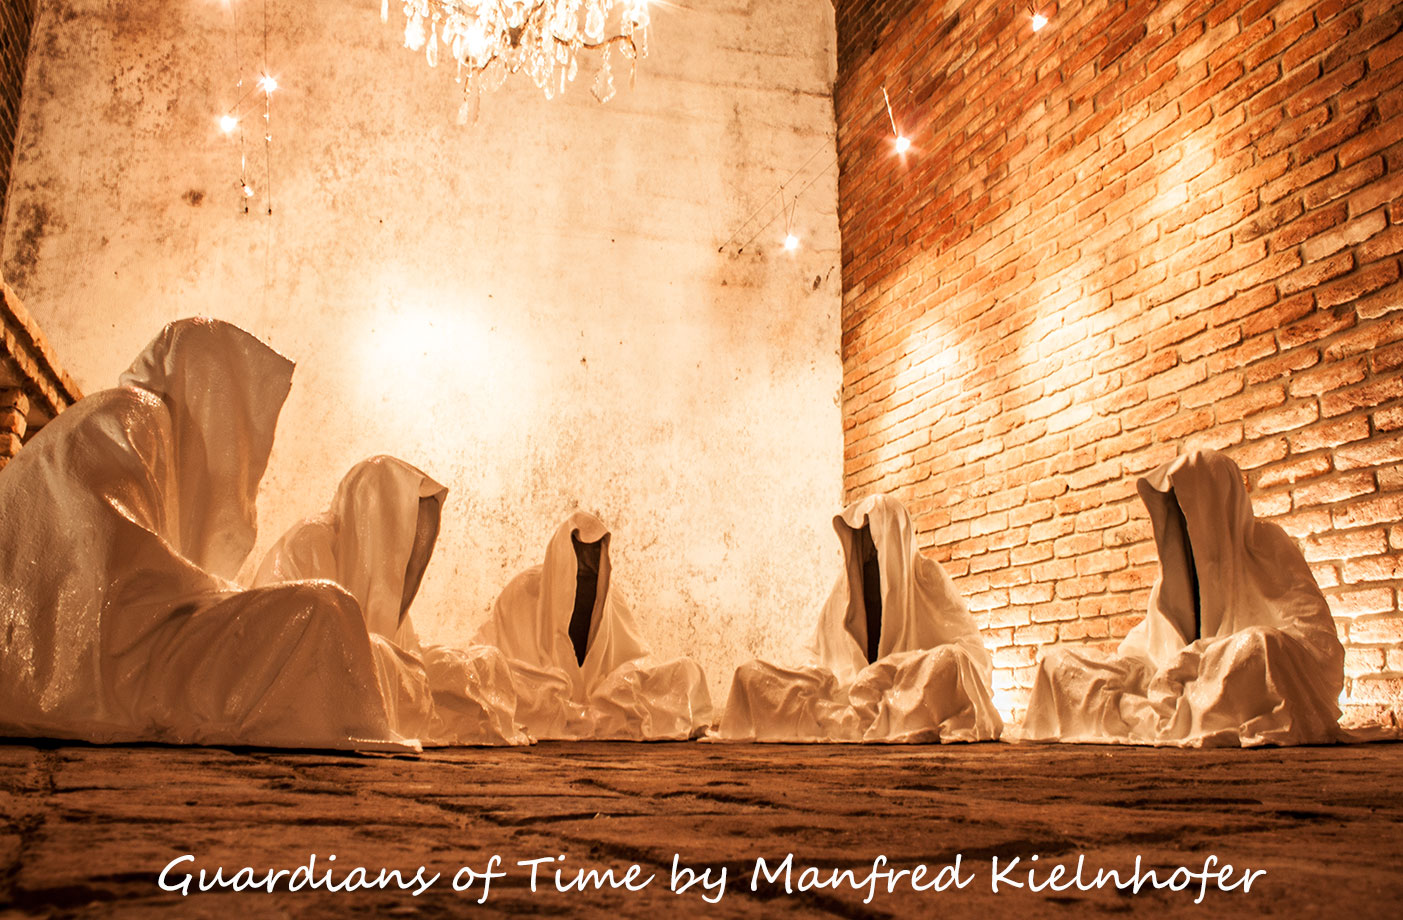 freller-art-dealer-kunsthandel-guardians-of-time-sculptor-manfred-kielnhofer-contemporary-modern-fine-arts-antique-sculpture-22256